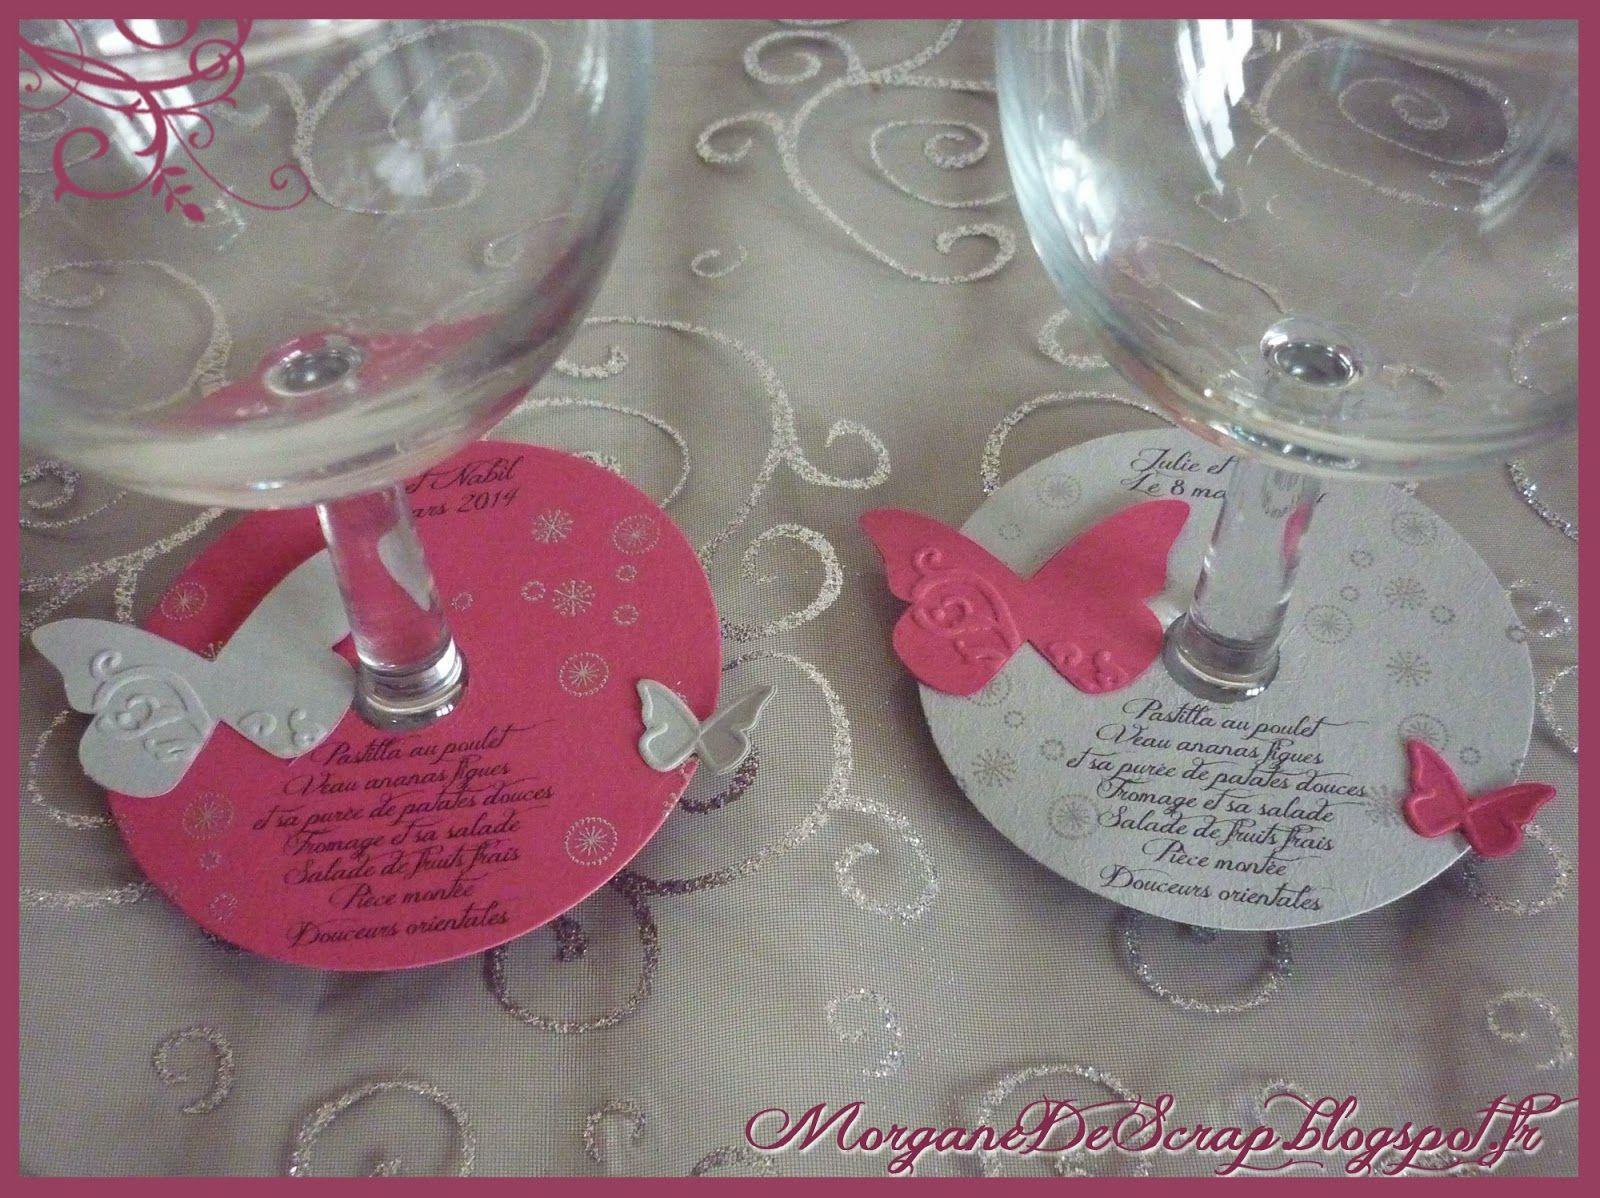 Morgane De Scrap Menus De Mariage Scrap Deco Table Pinterest Menu De Mariage Menus Et Scrap